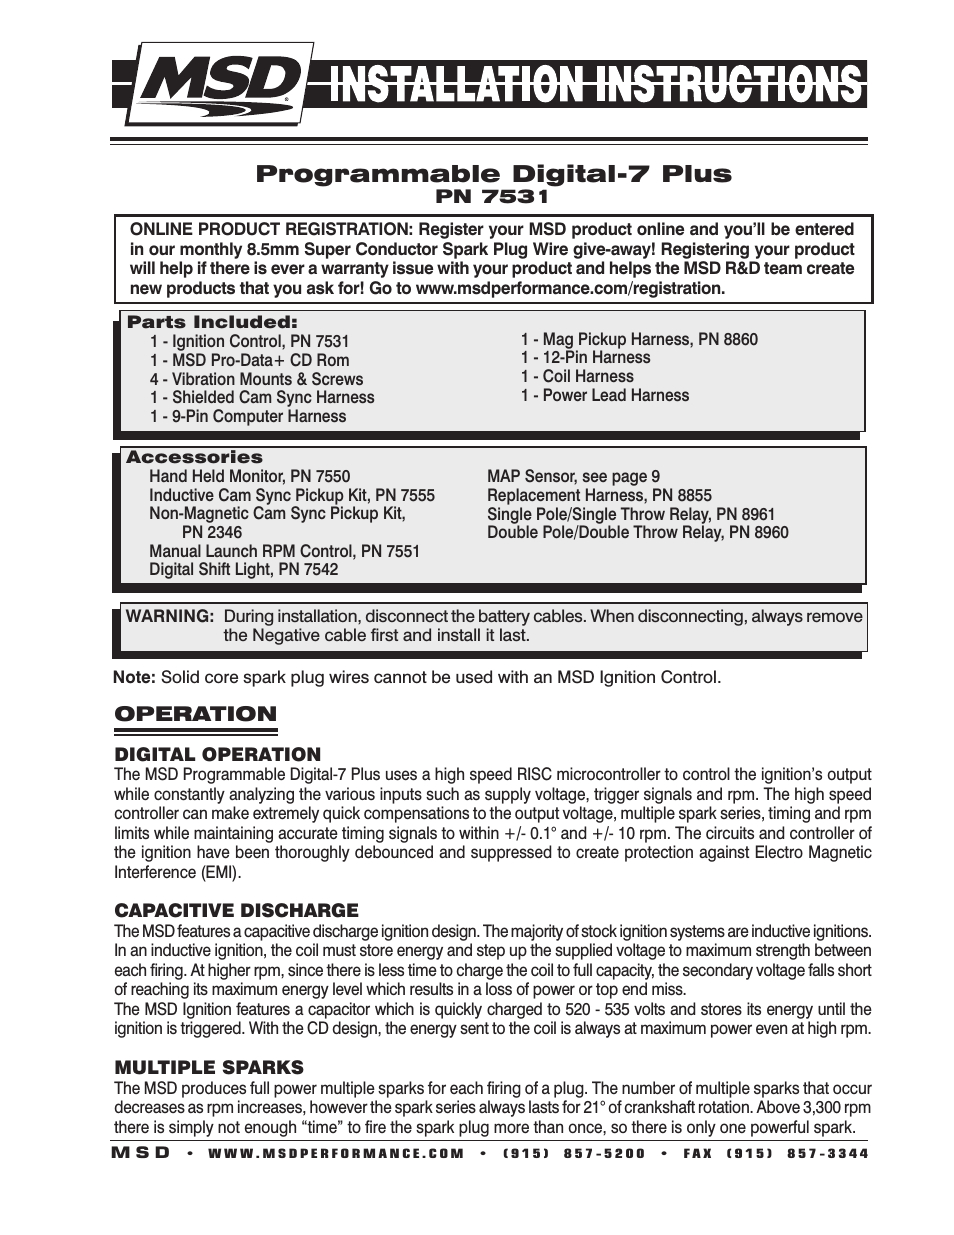 msd 7531 programmable digital 7 plus installation user manual 20 pages msd digital 7 plus wiring diagram msd digital 7 wiring diagram